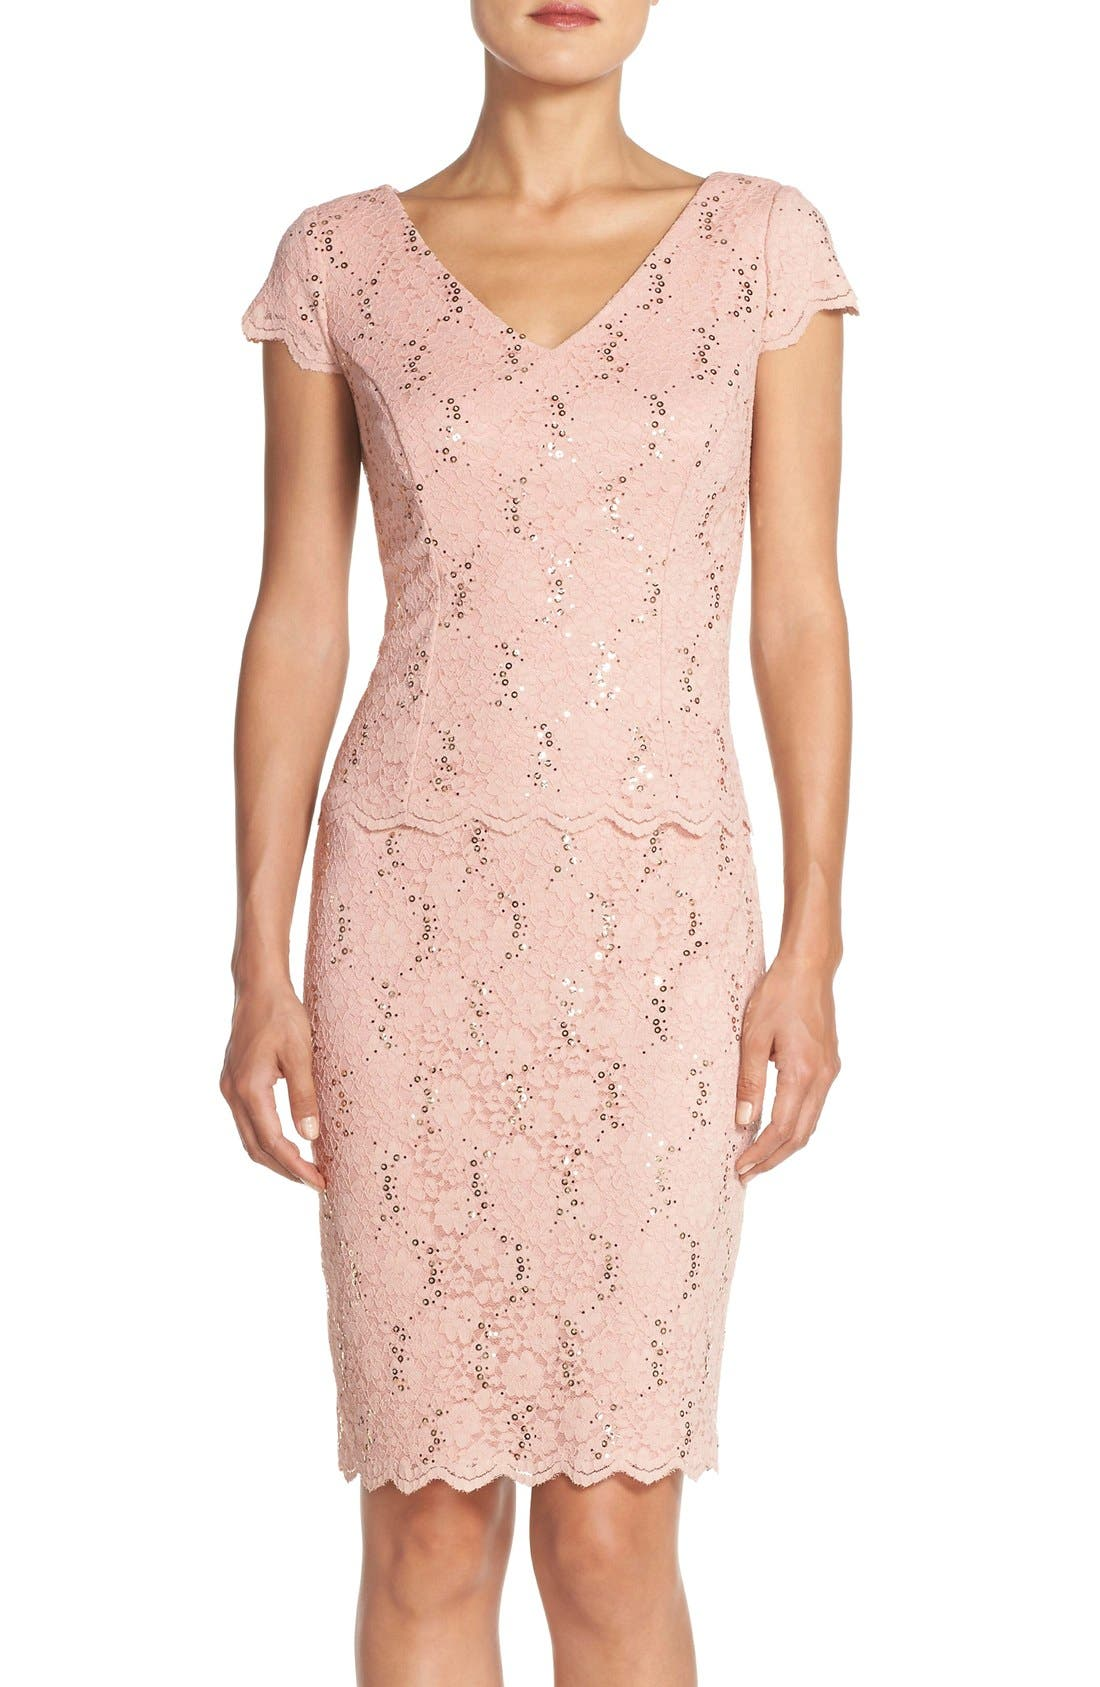 Alternate Image 1 Selected - Alex Evenings Embellished Lace Sheath Dress